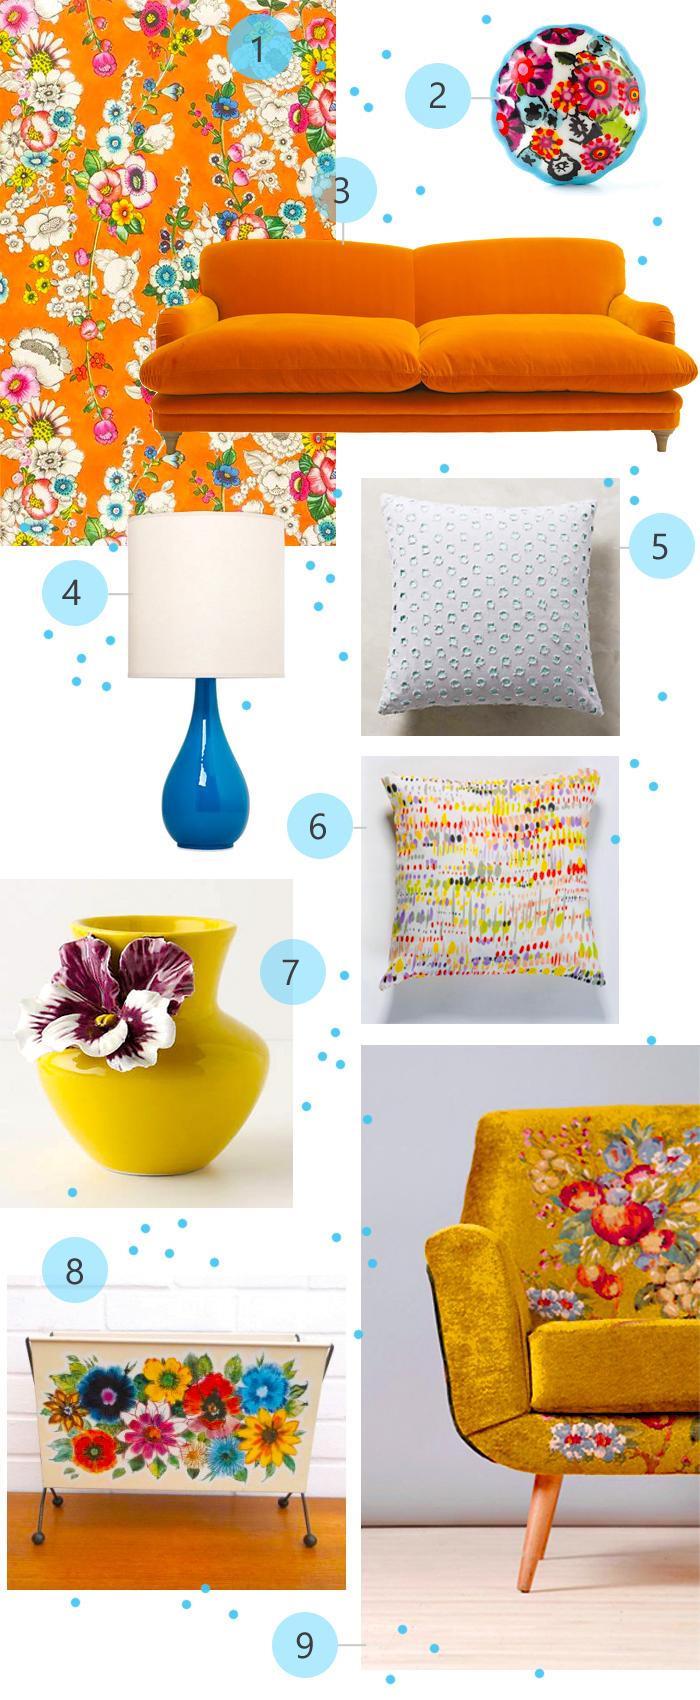 retro-livingroom-interior-emmajayne-designs